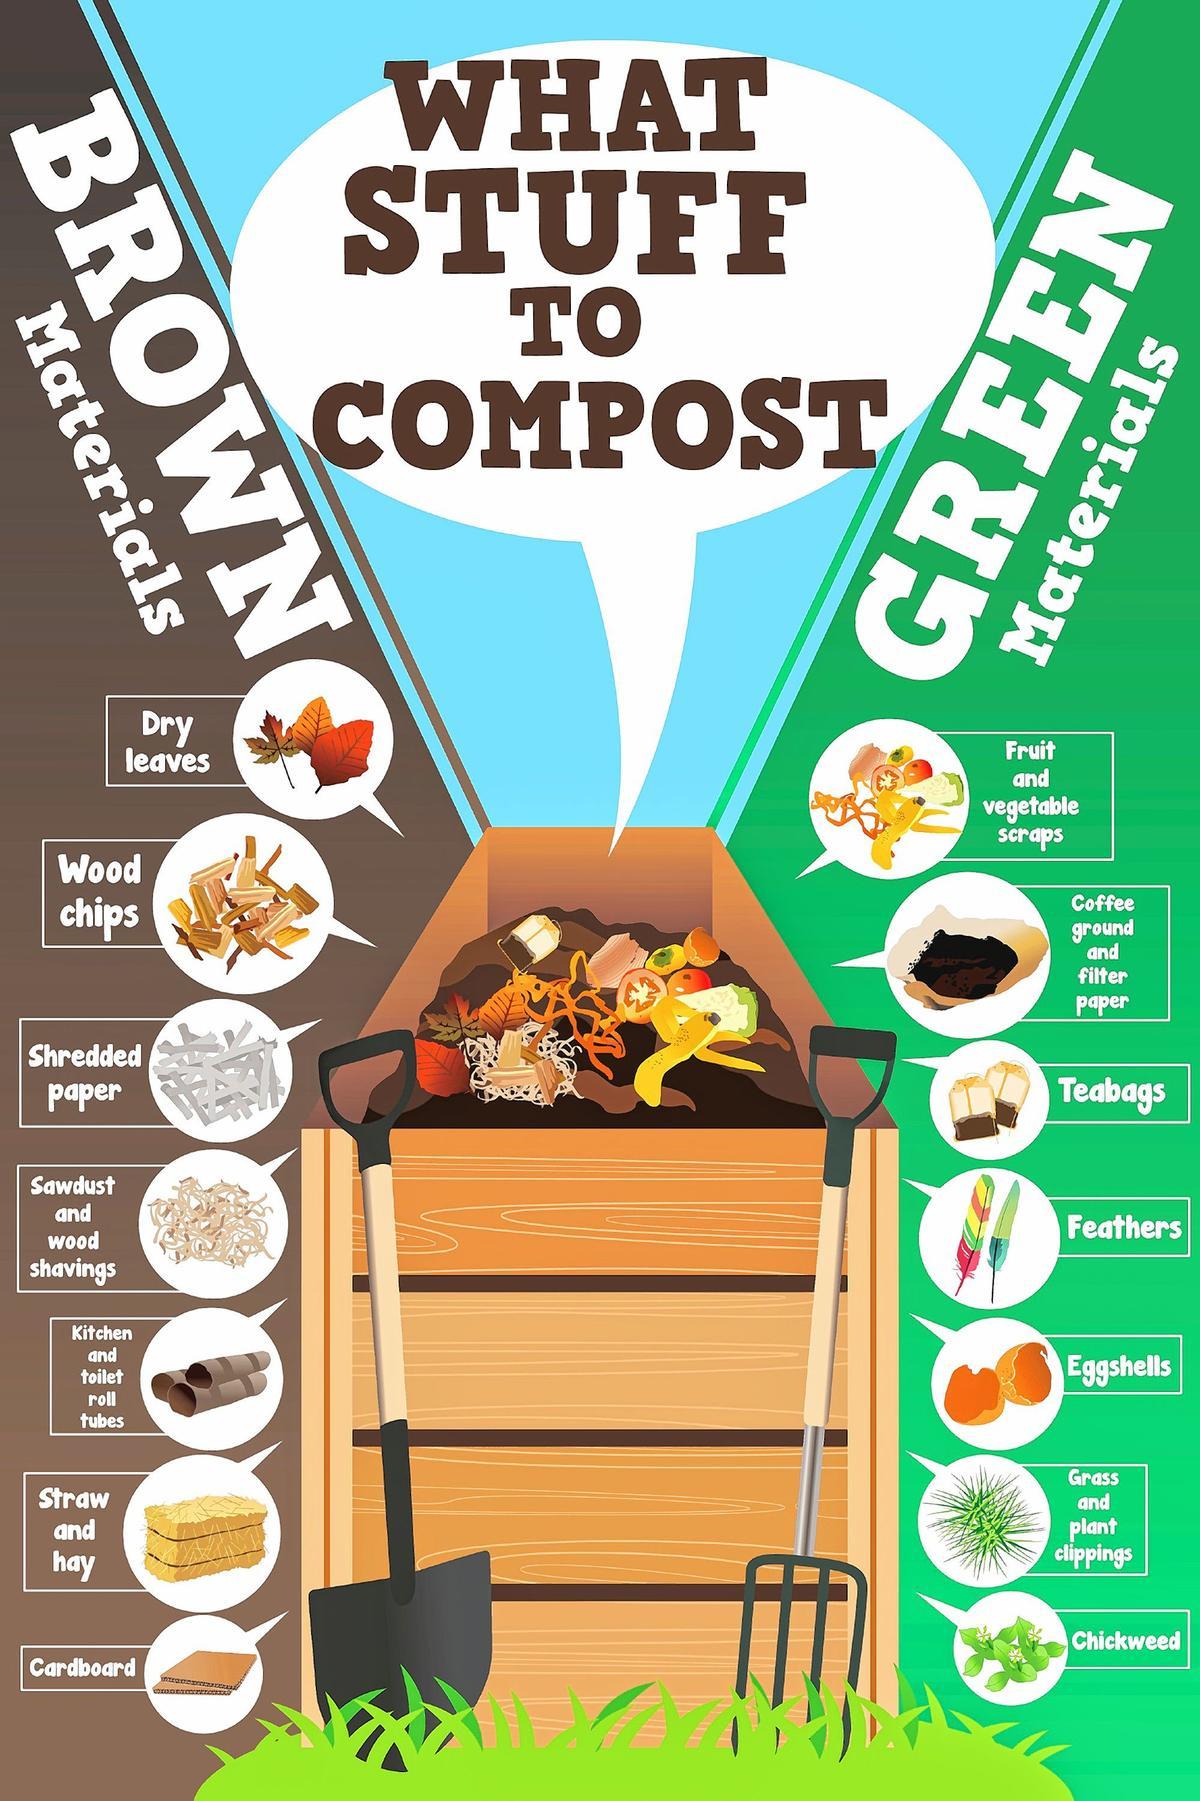 Down To Earth When Life Gives You Lemon Peels Make Compost